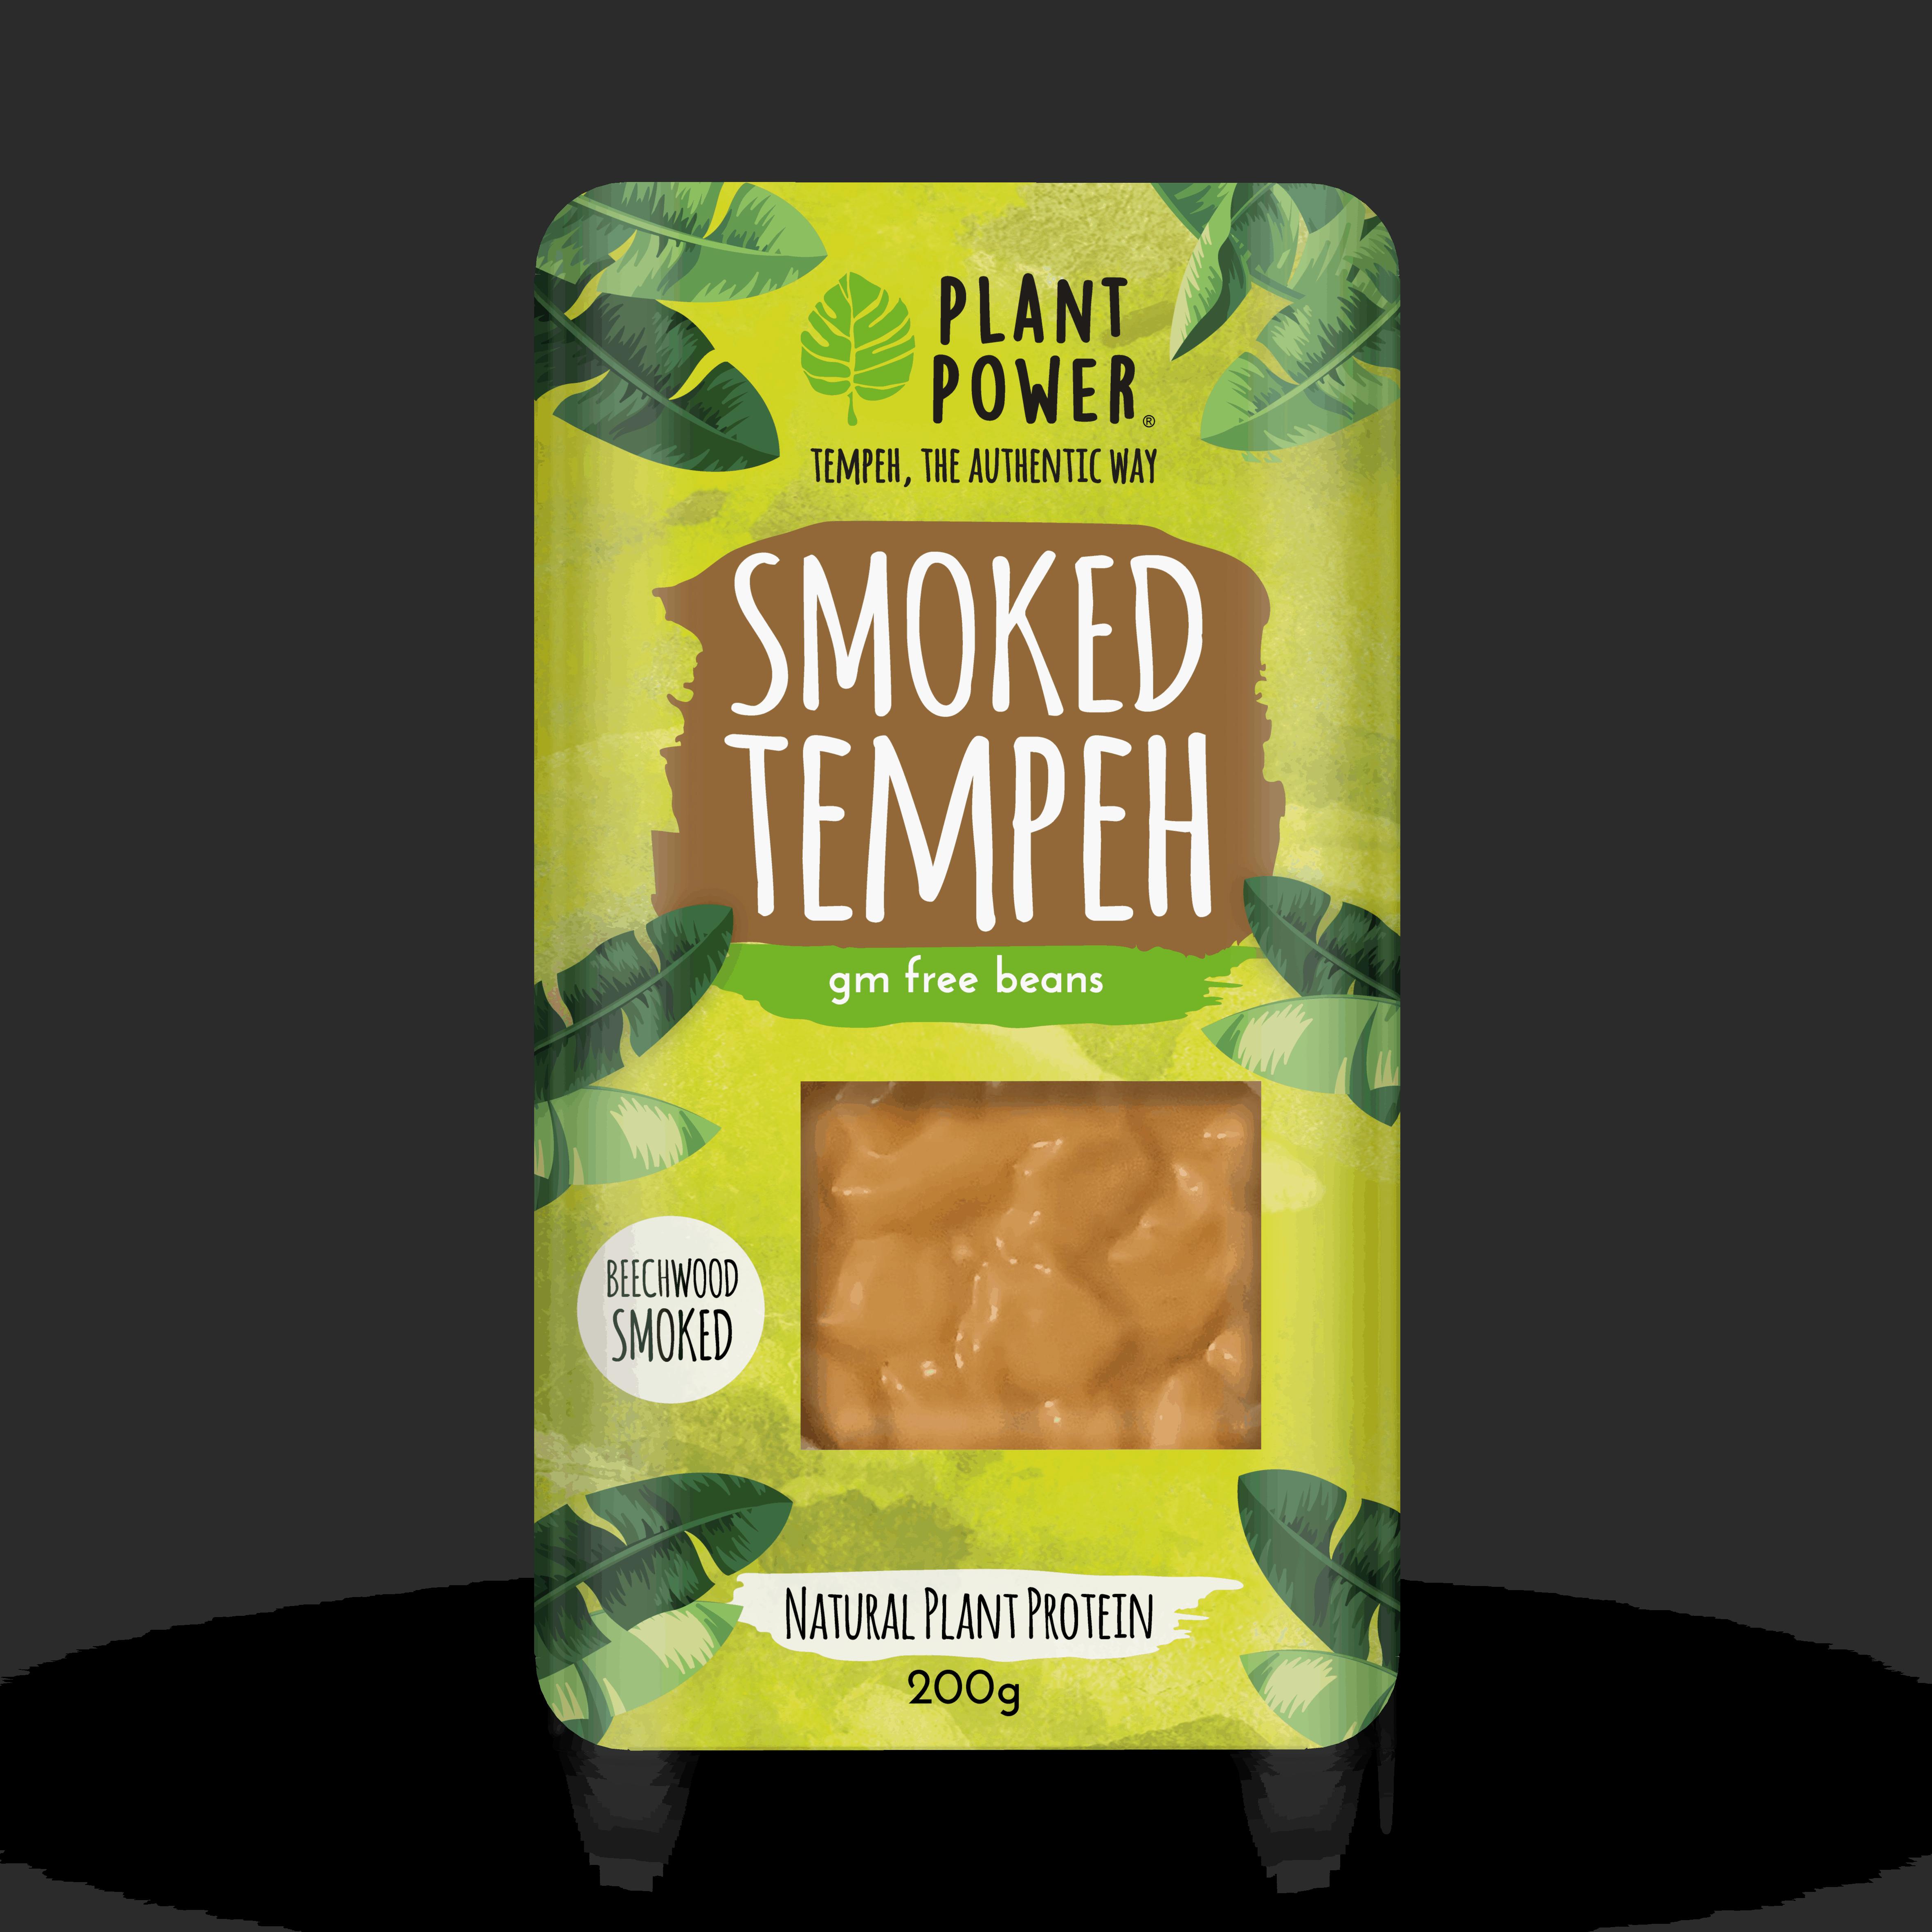 Plant Power tempeh